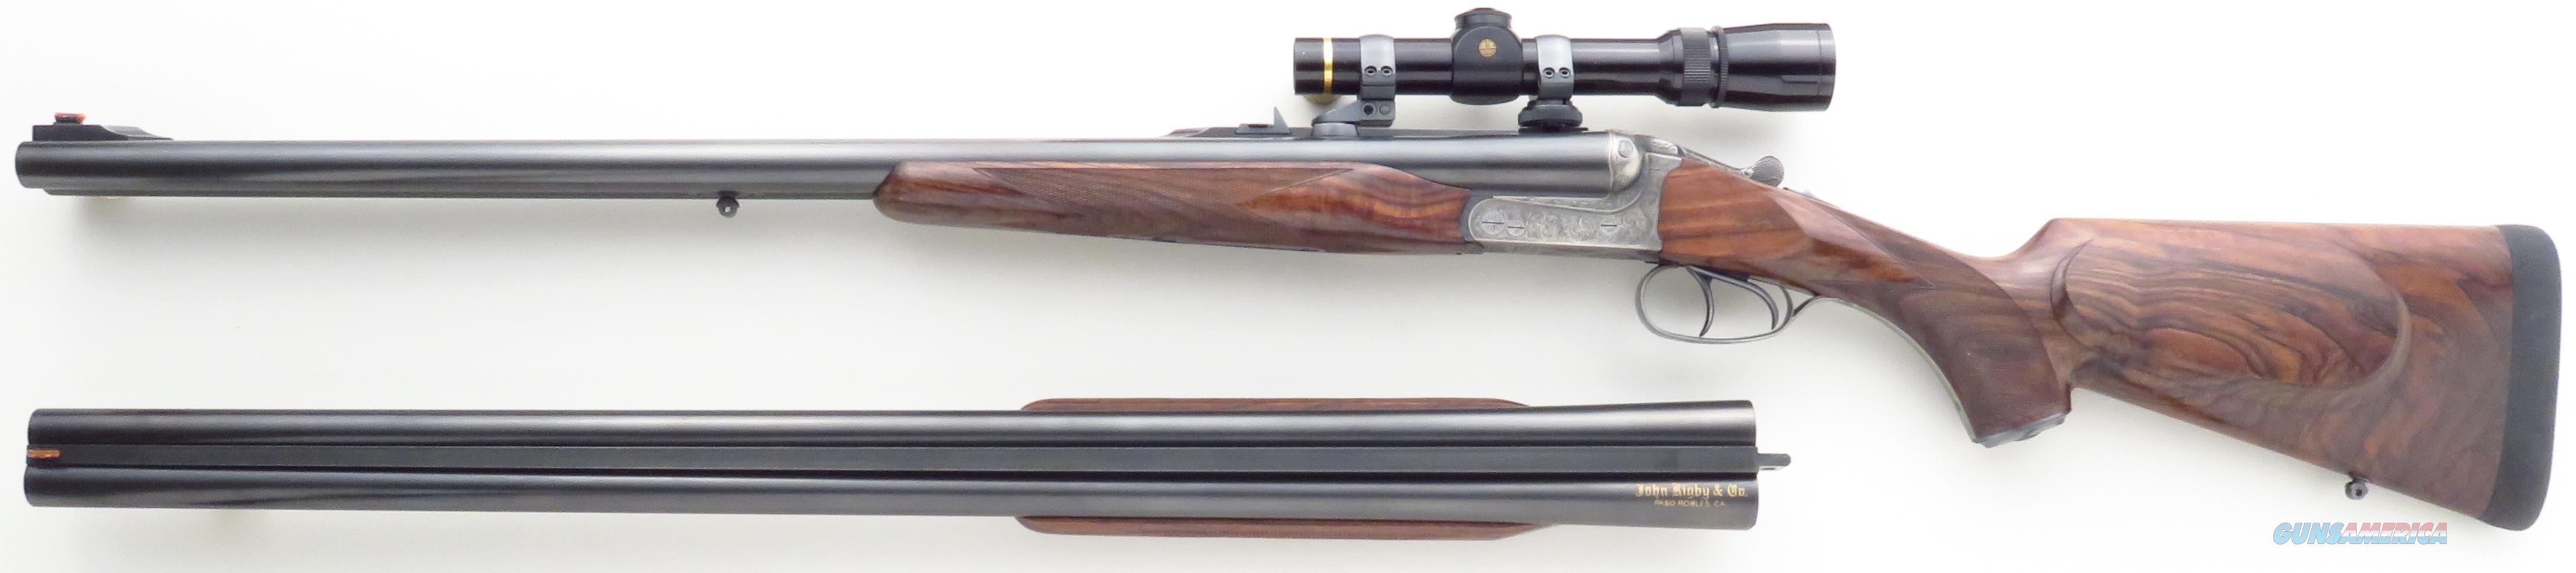 Rigby .470 Nitro Express, extra 12 gauge barrels, case, engraved, EAA quick detach, scope, case, mint condition  Guns > Rifles > Double Rifles (Misc.)